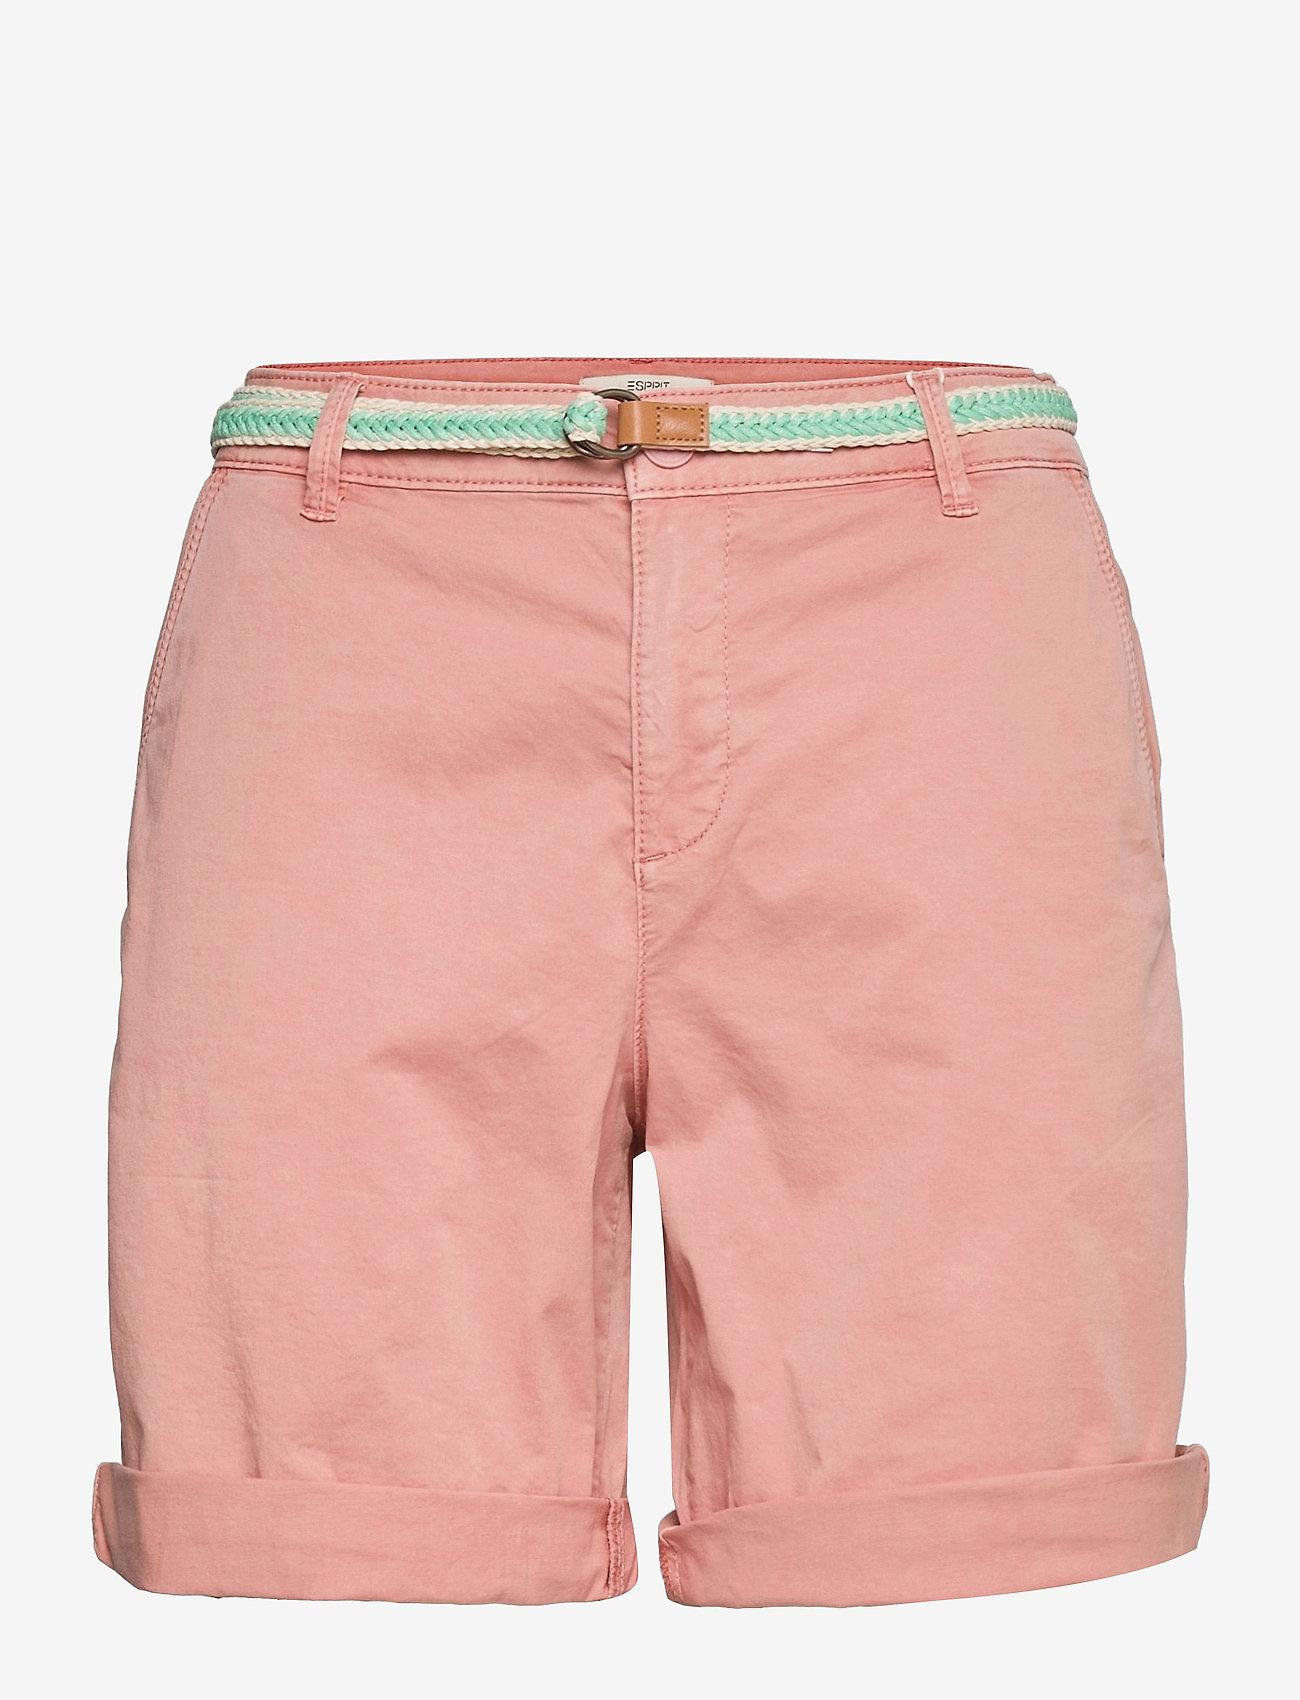 Esprit Casual - Shorts woven - chino shorts - nude - 0